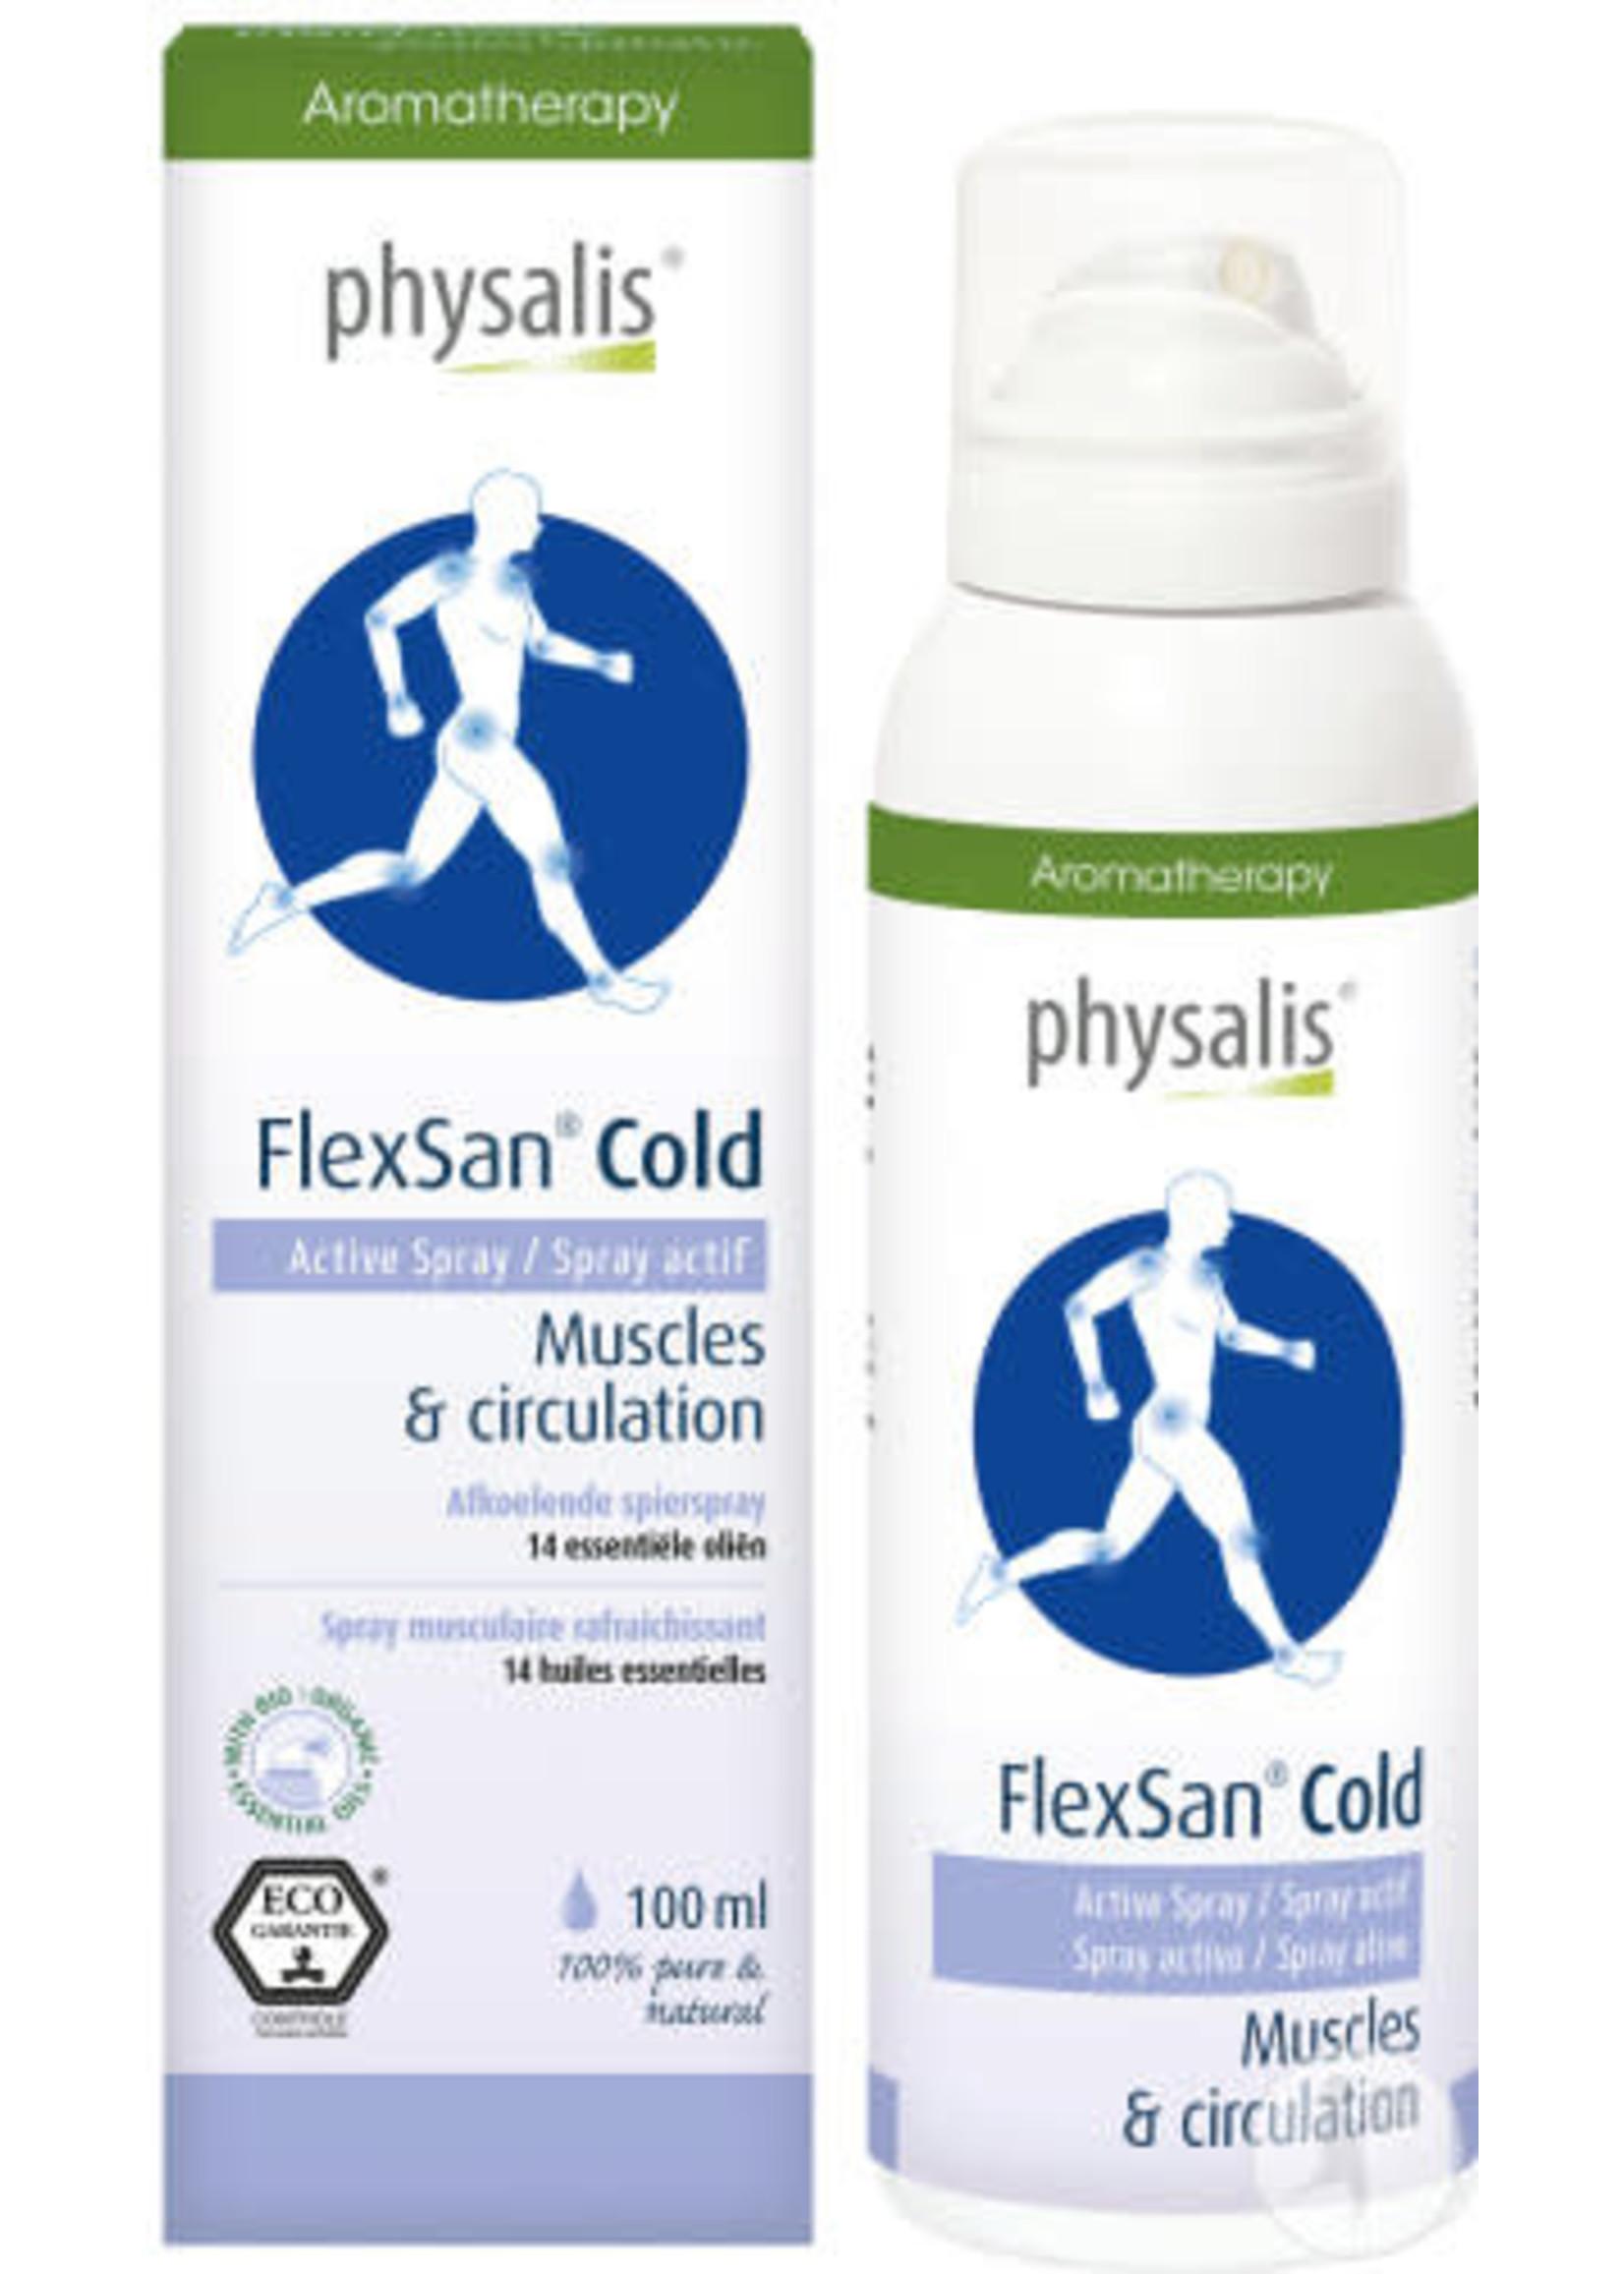 Physalis FlexSan Cold